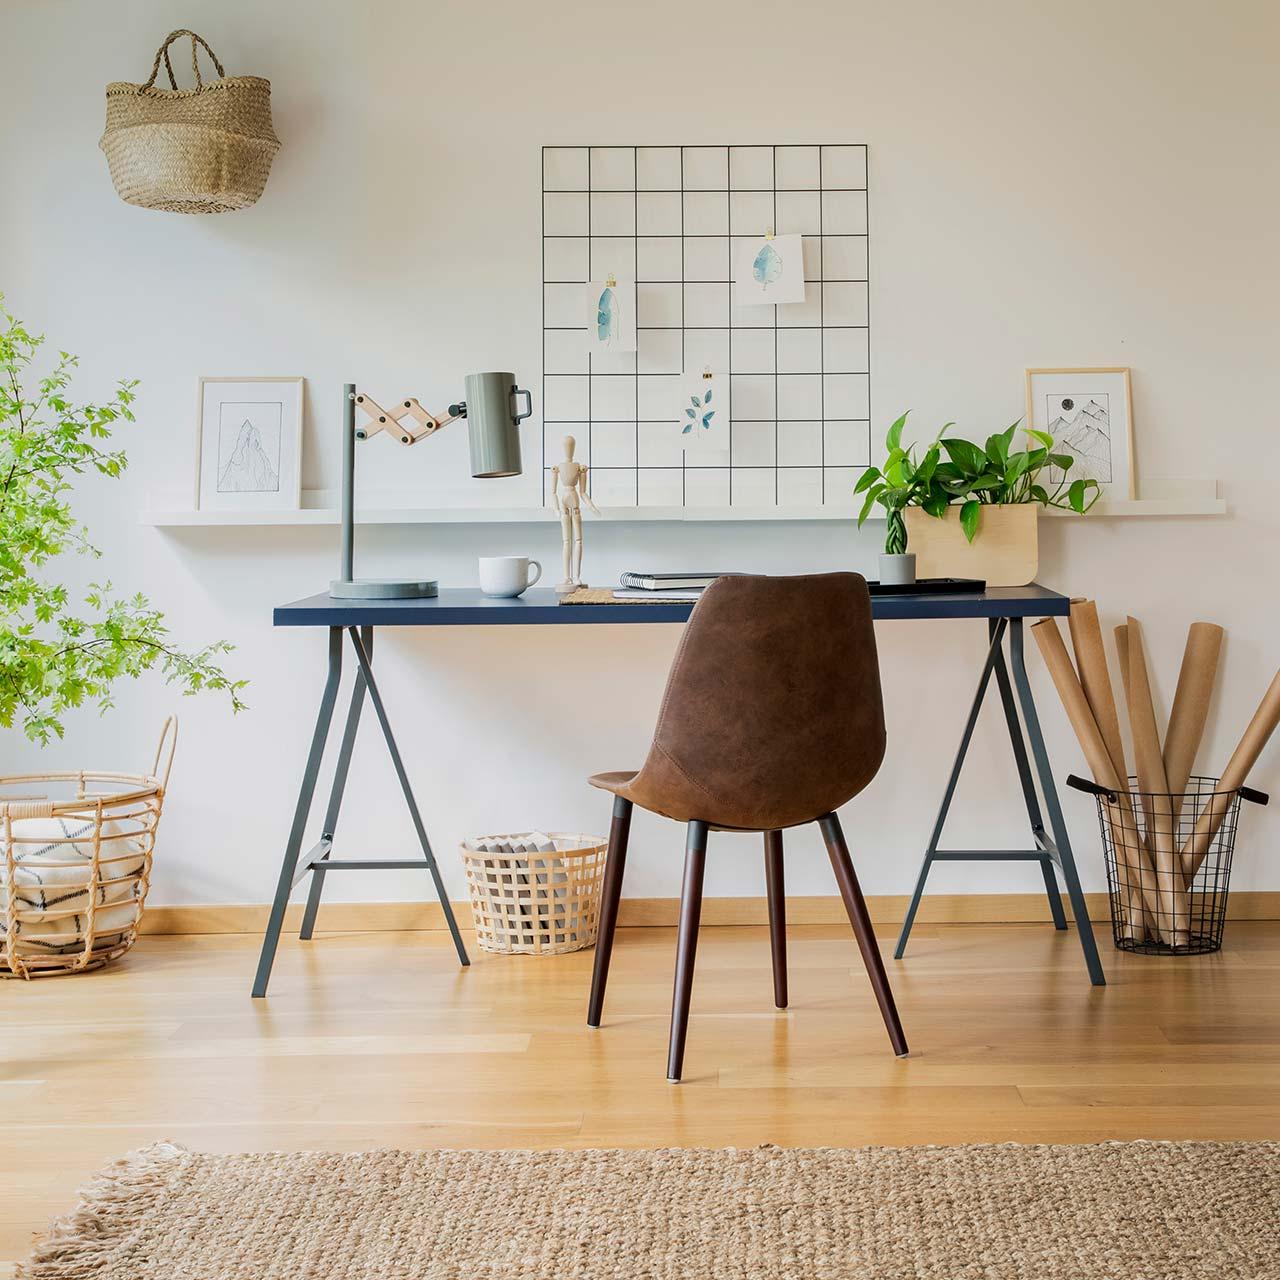 Latest Study Room Interior Design Ideas Design Cafe